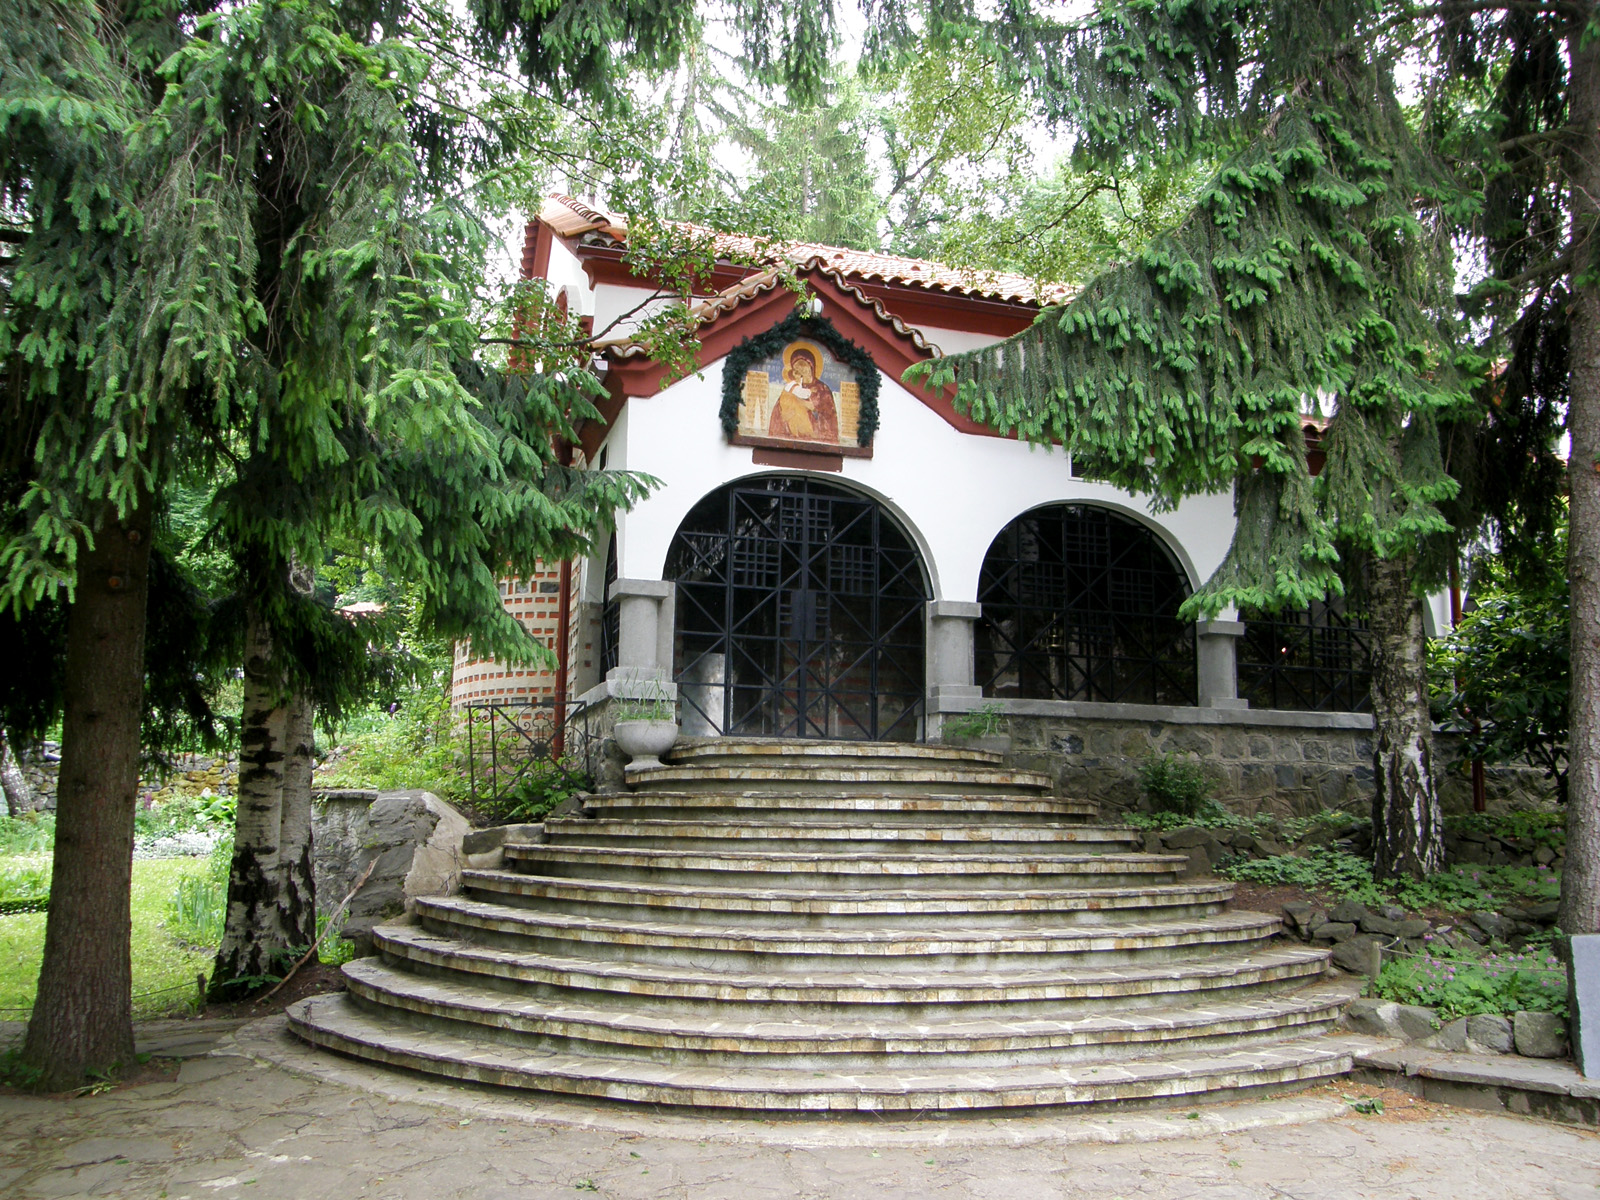 Dragalevski-Manastir-entrance-icon-Holy-Virgin-Mary